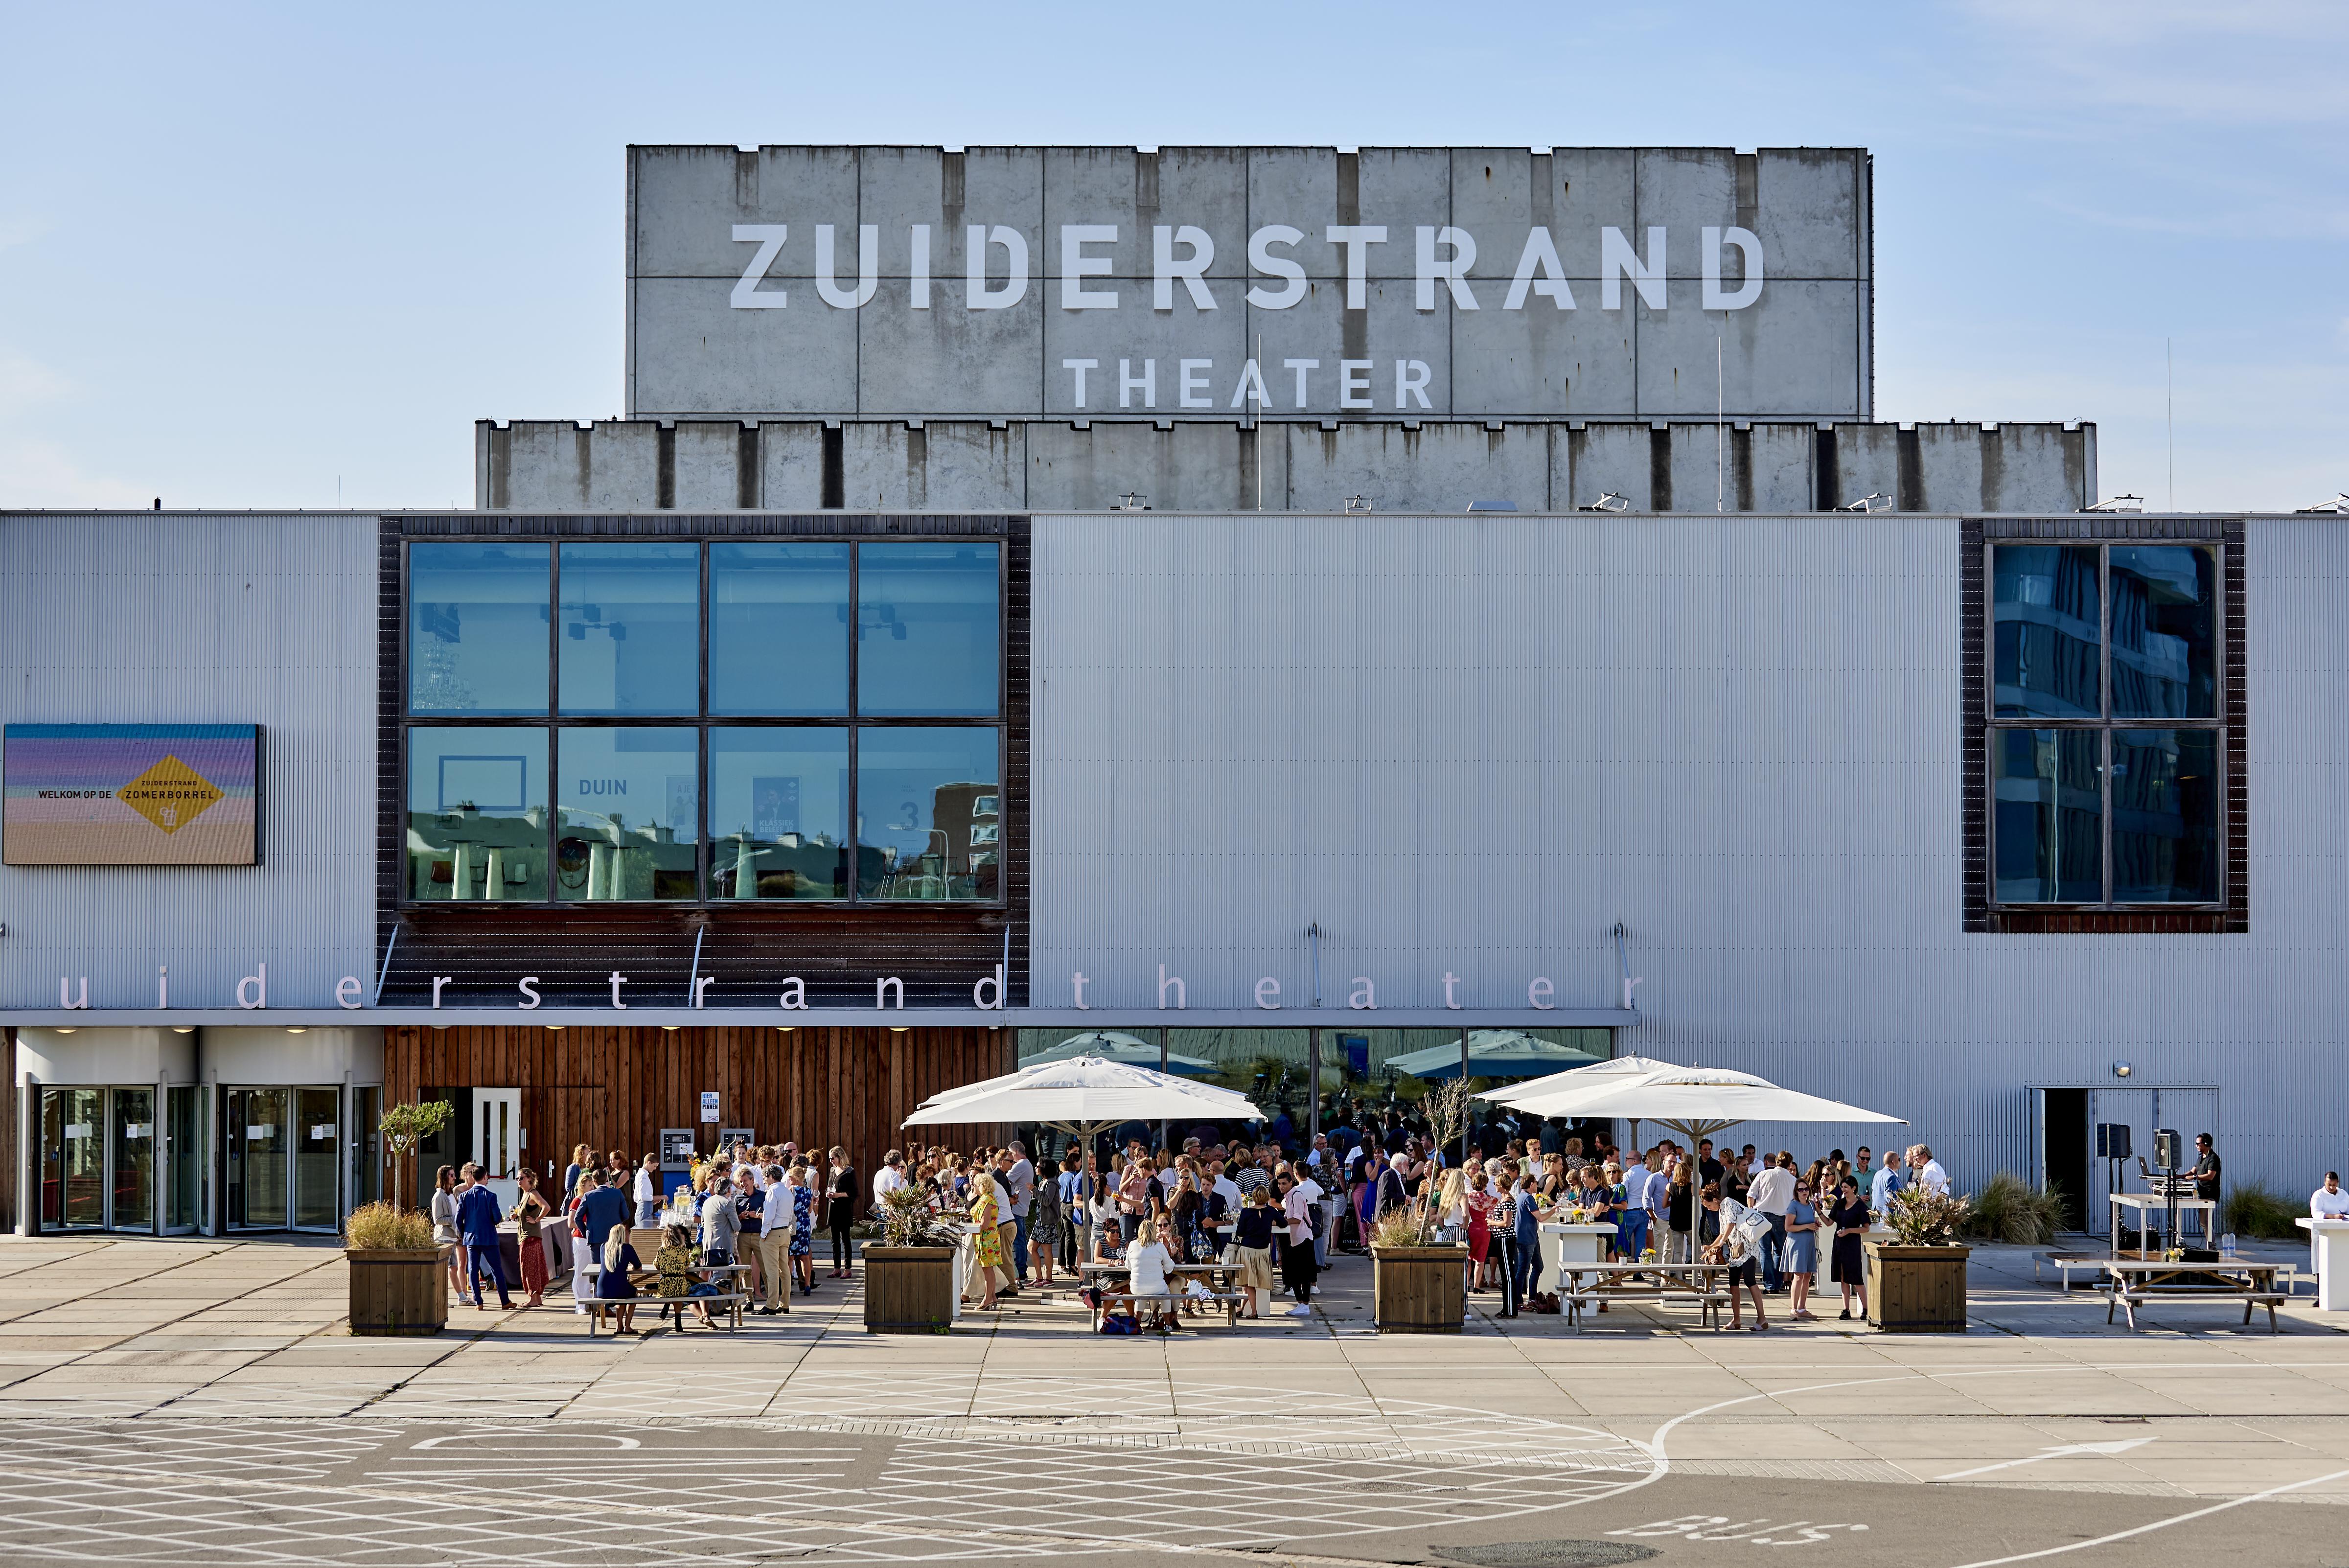 Zuiderstrandtheater2018.jpg